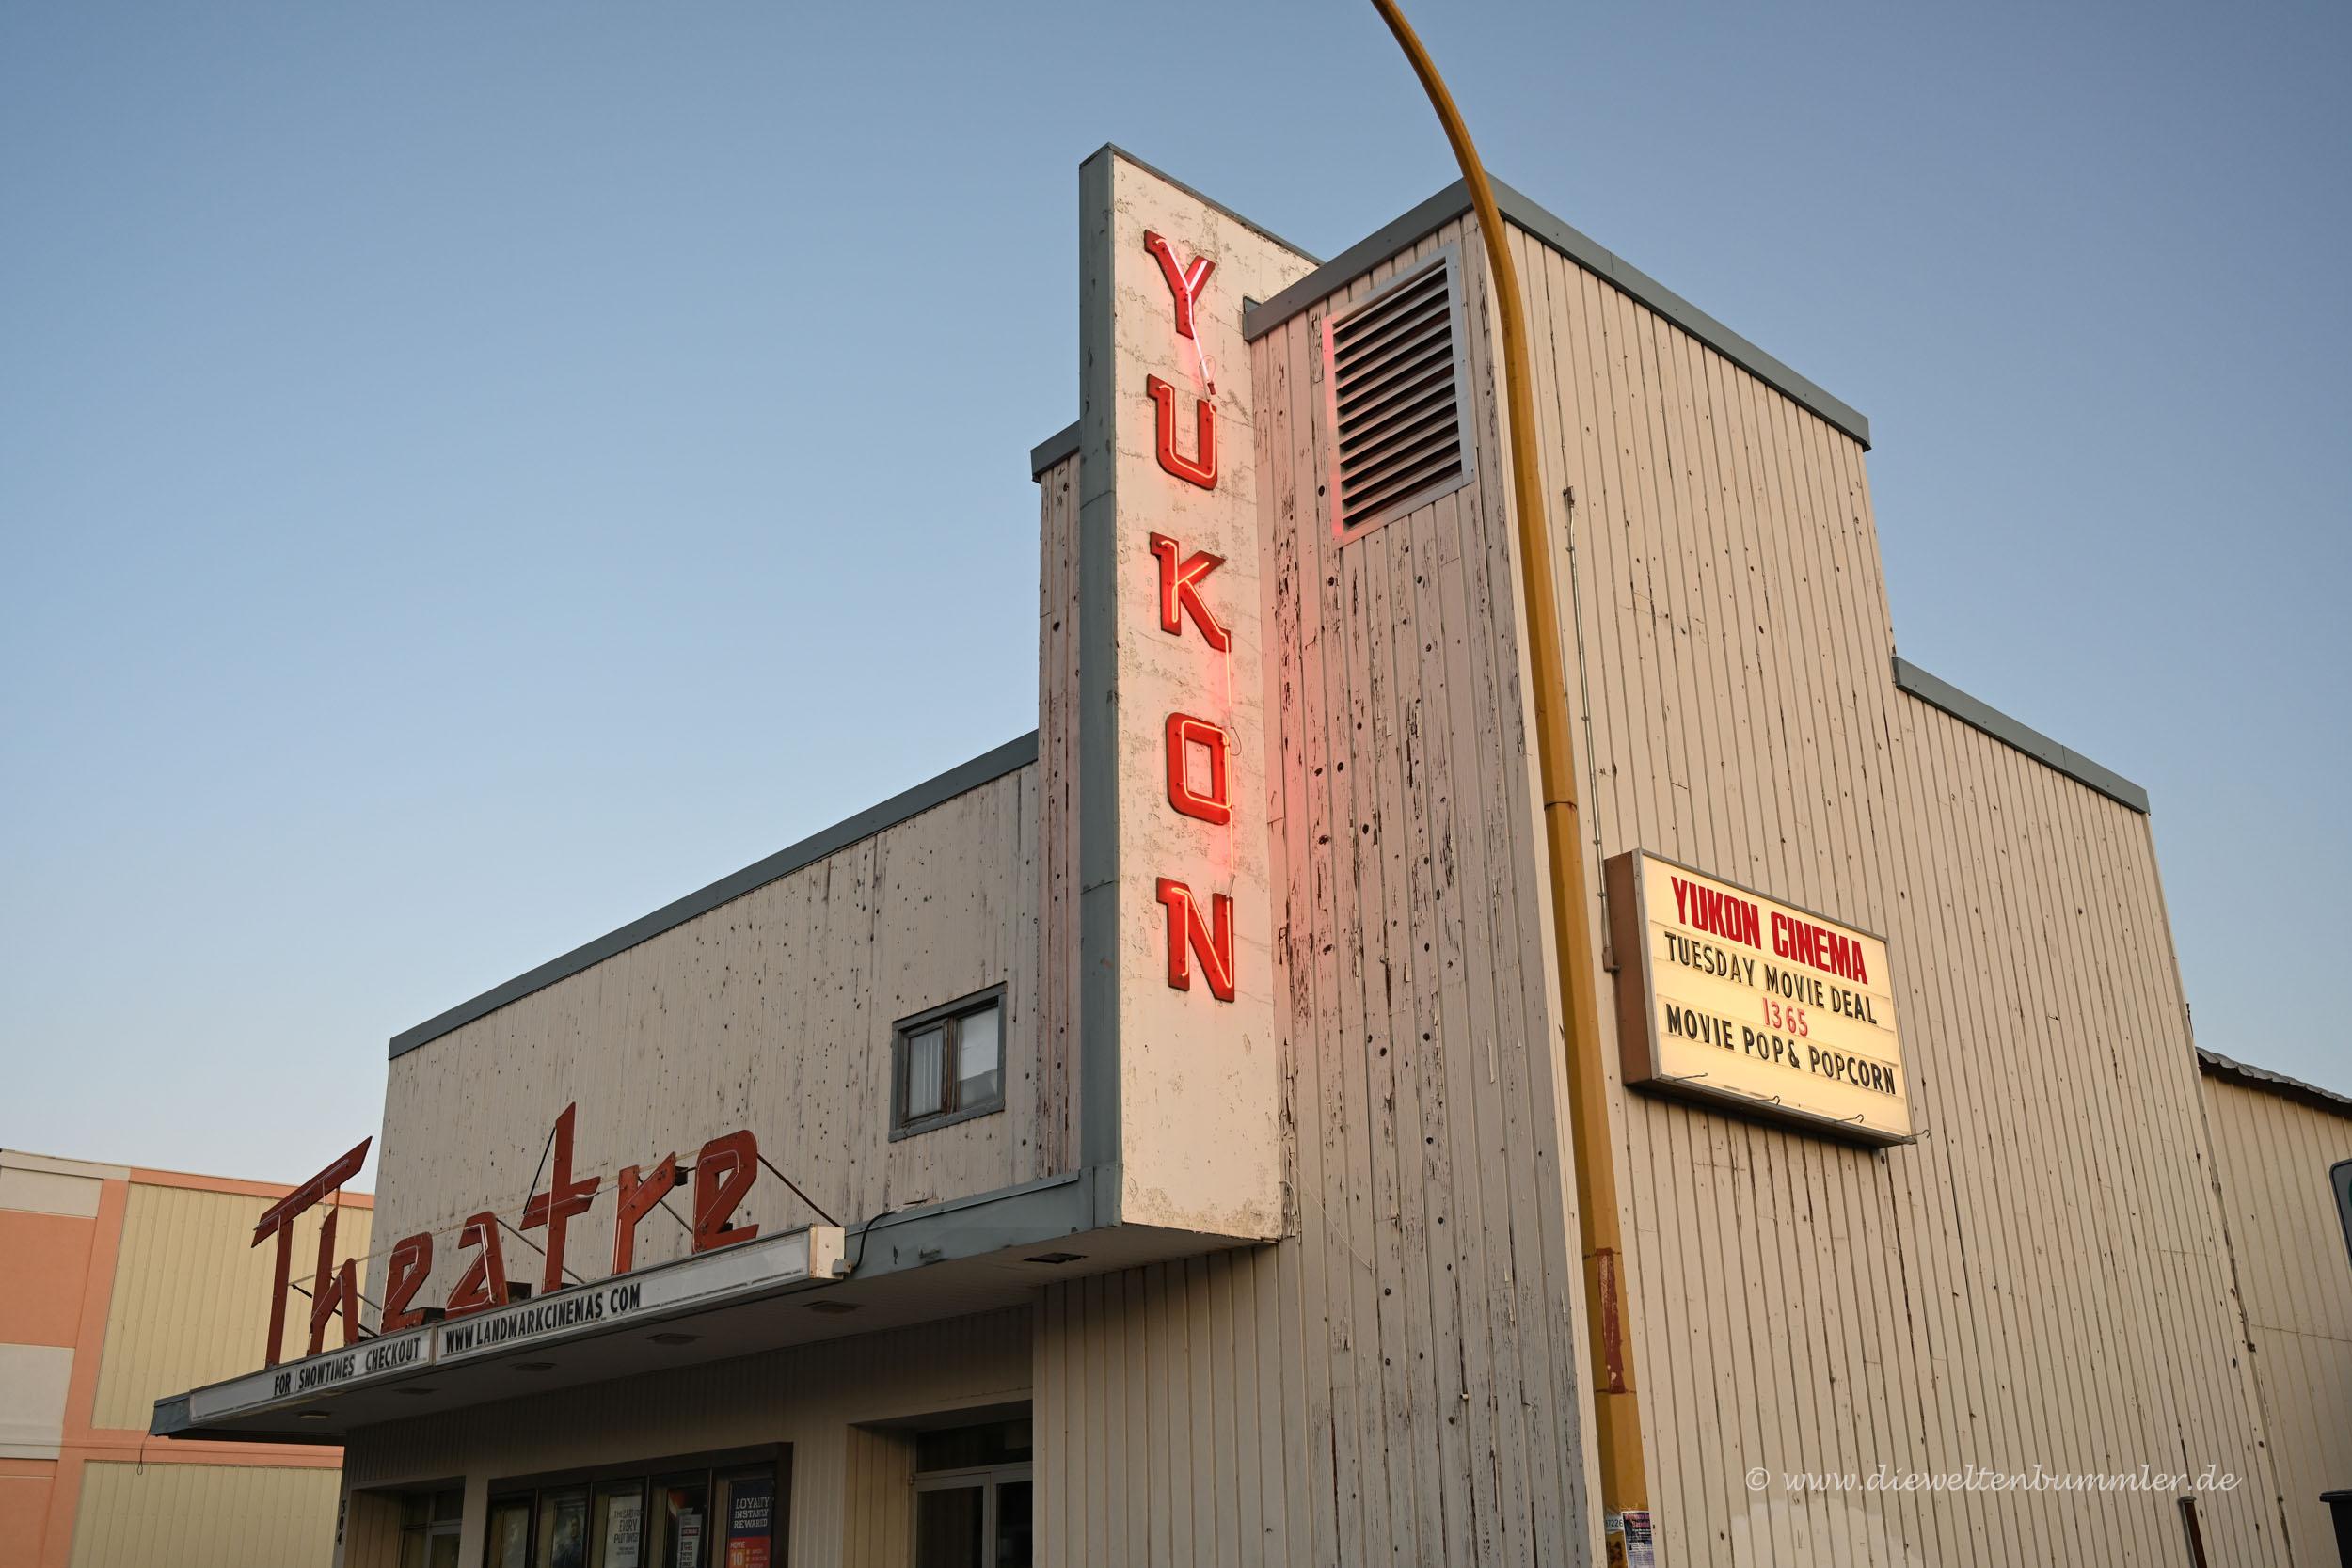 Yukon Theater in Whitehorse